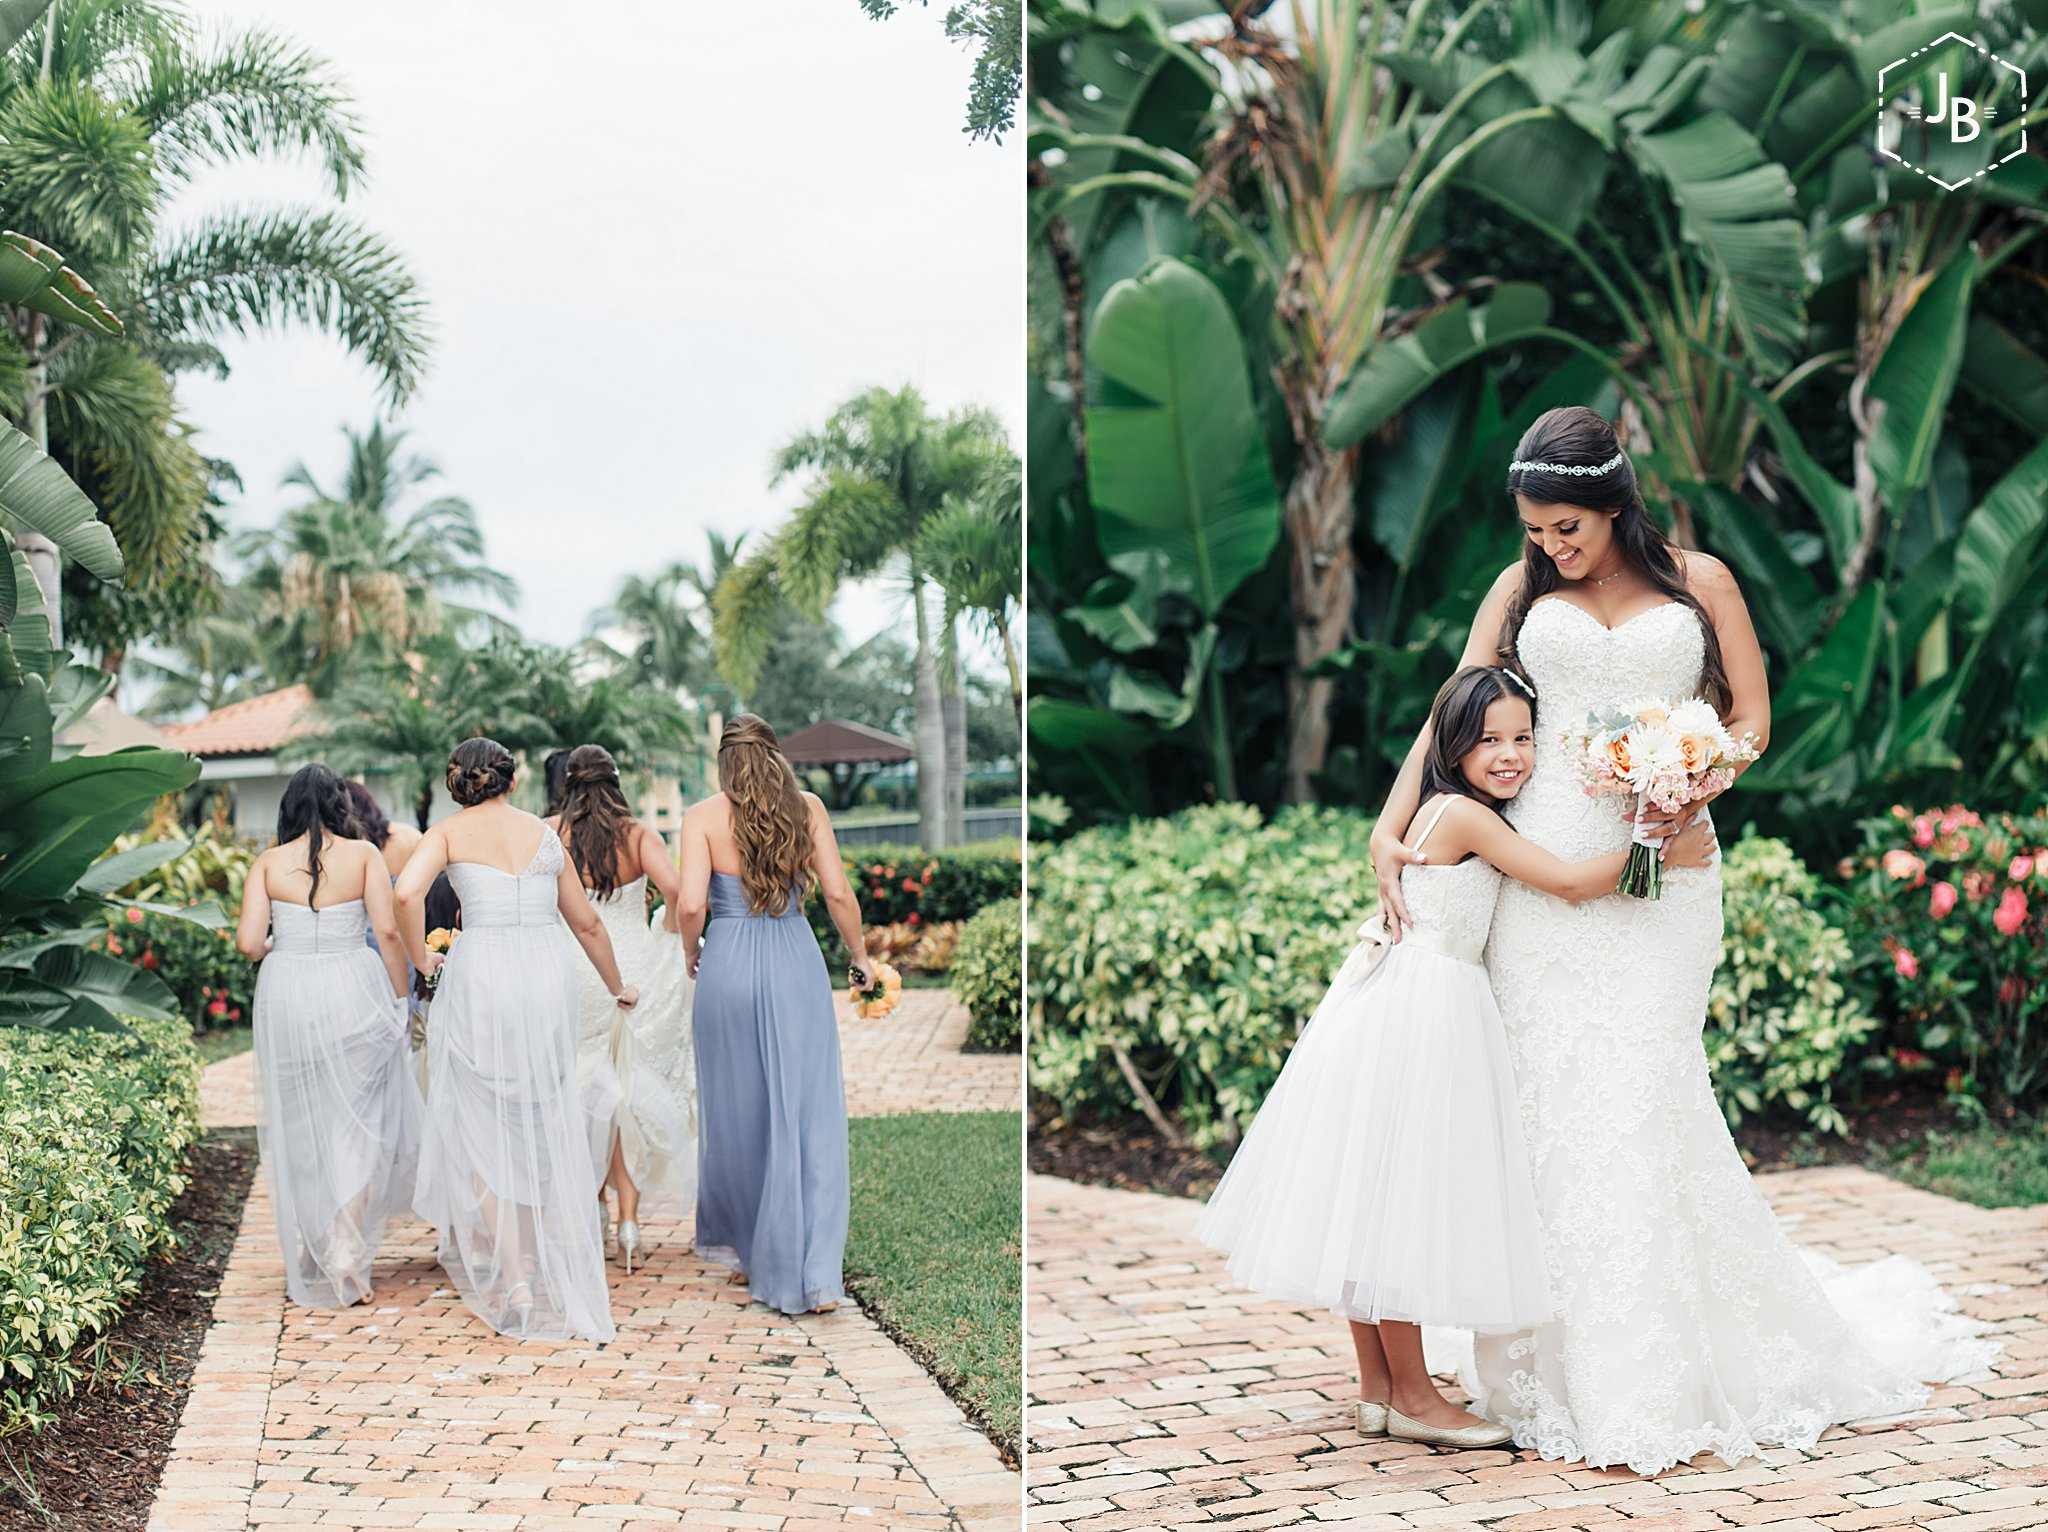 WeddingandEngagementFloridaPhotographer_2790.jpg